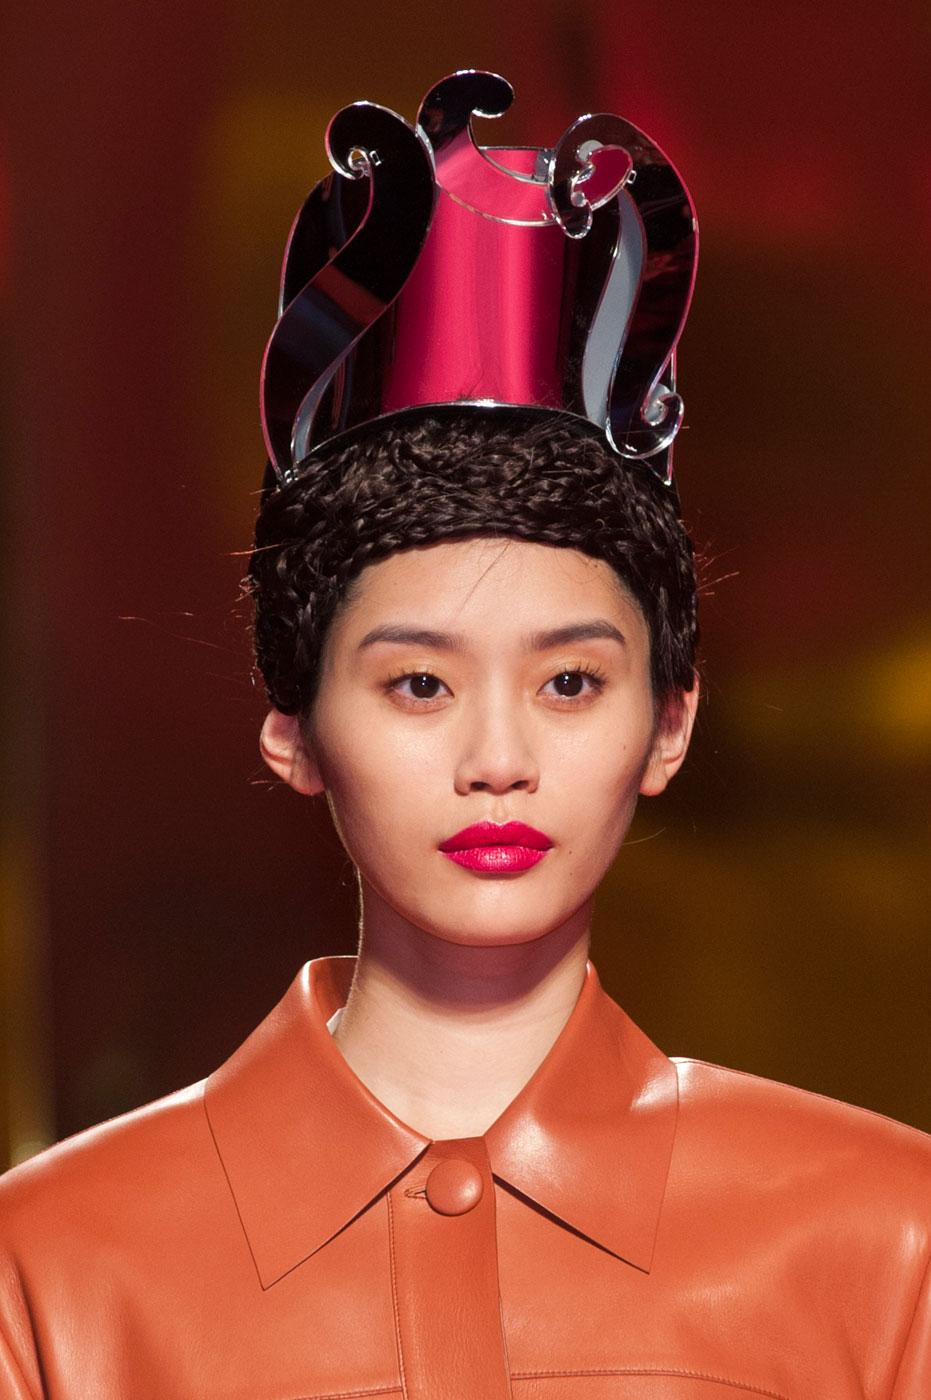 Schiaparelli-fashion-runway-show-close-ups-haute-couture-paris-spring-summer-2015-the-impression-07